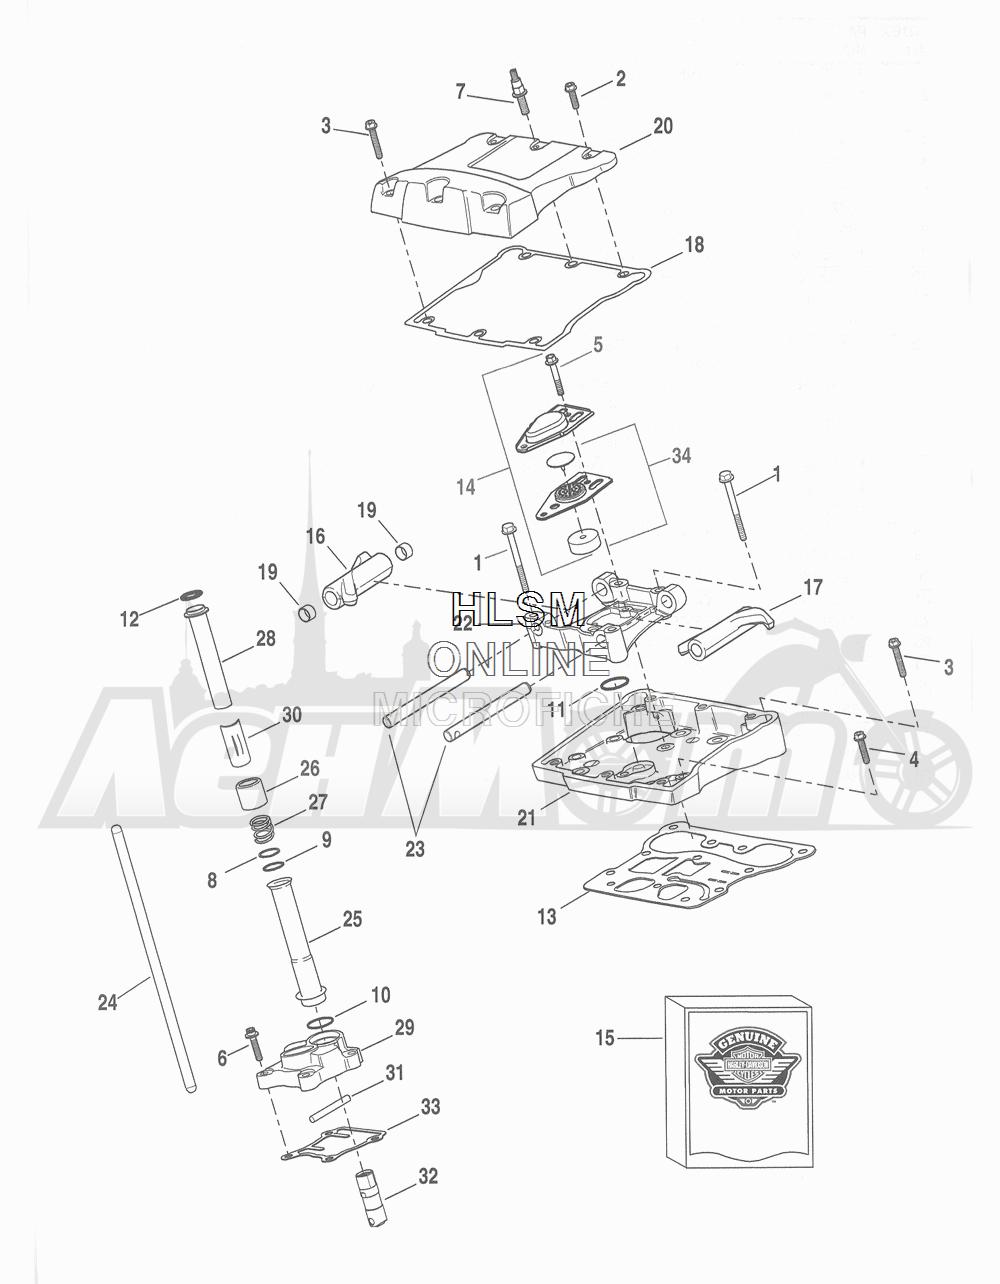 Запчасти для Мотоцикла Harley-Davidson 2016 FLHTCU 103 ULTRA CLASSIC ELECTRAGLIDE (FCM) Раздел: ROCKER ARM ASSEMBLY W/ PUSHRODS   коромысло (рокер) клапана в сборе вместе с толкатели